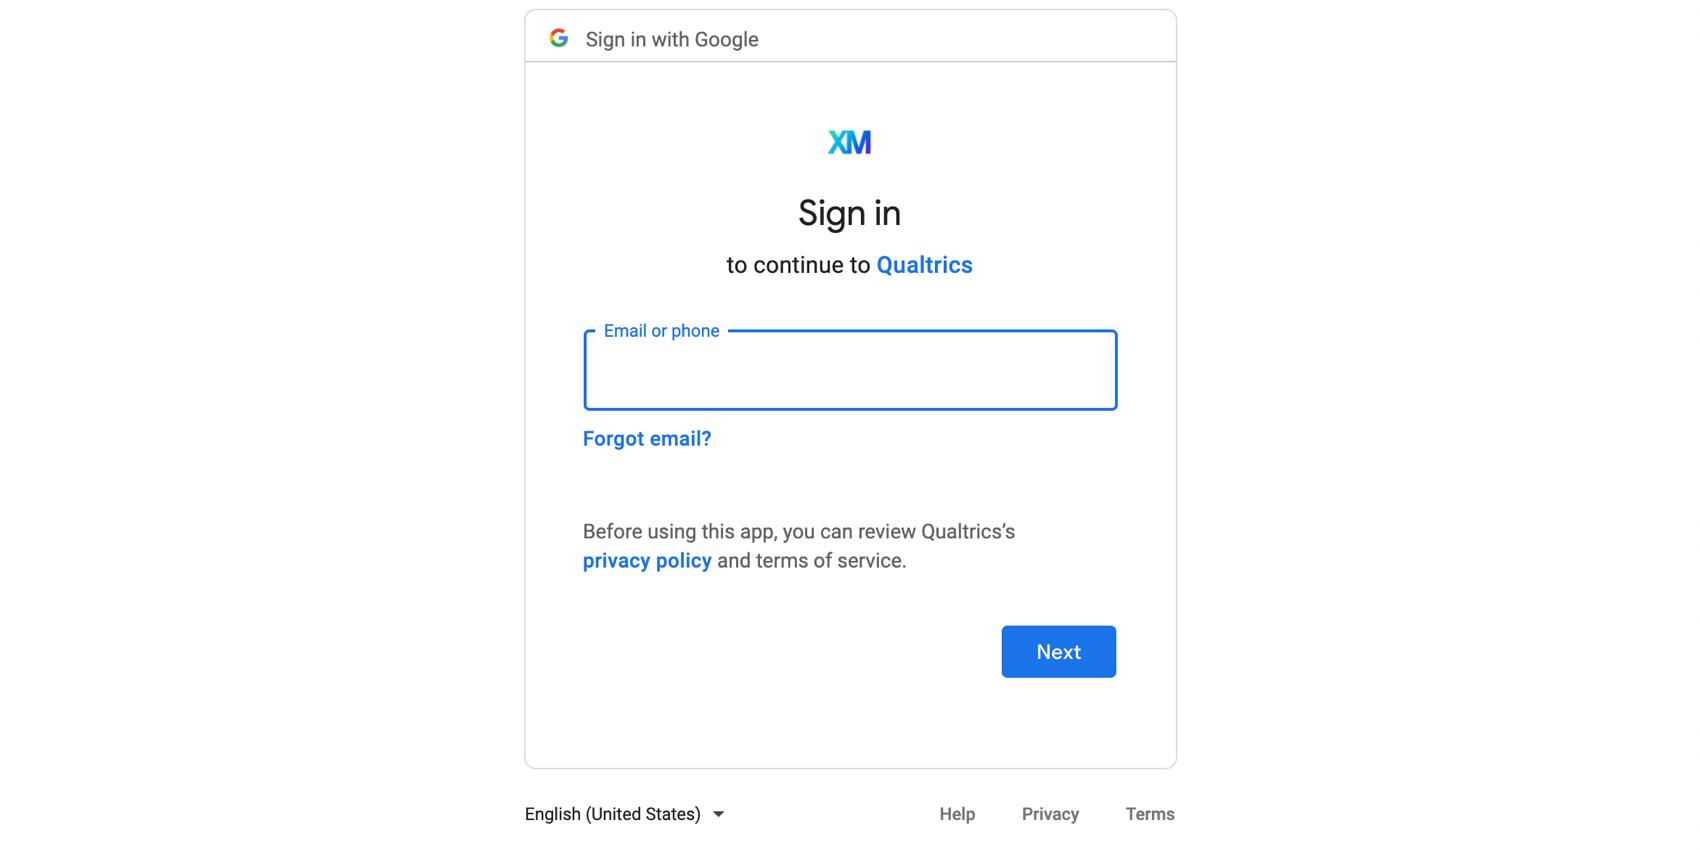 Google Calendar sign in screen